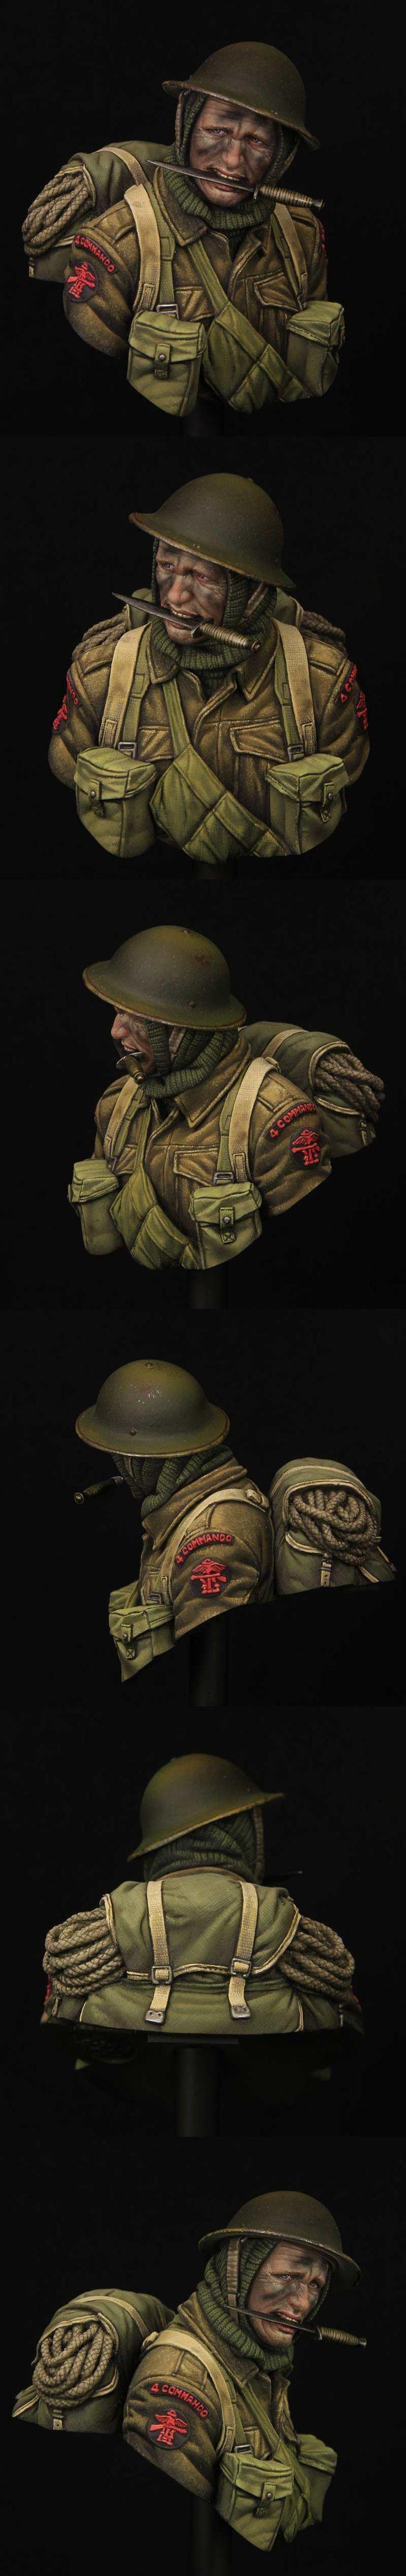 WWII British Commando 1  10 stupnice busta z mladých miniatur